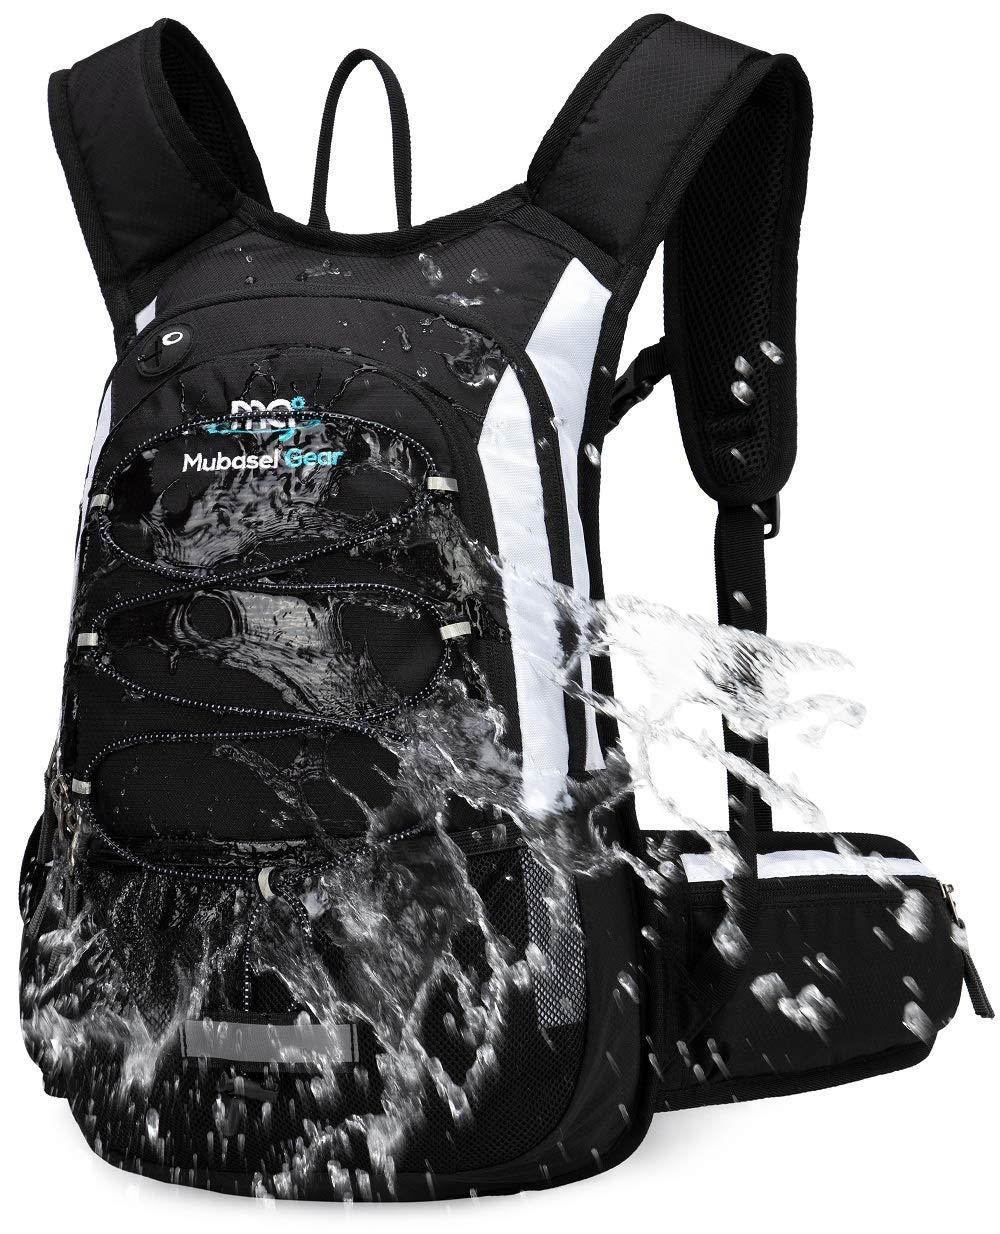 Mubasel Gear 2L BPA Free Hydration Backpack